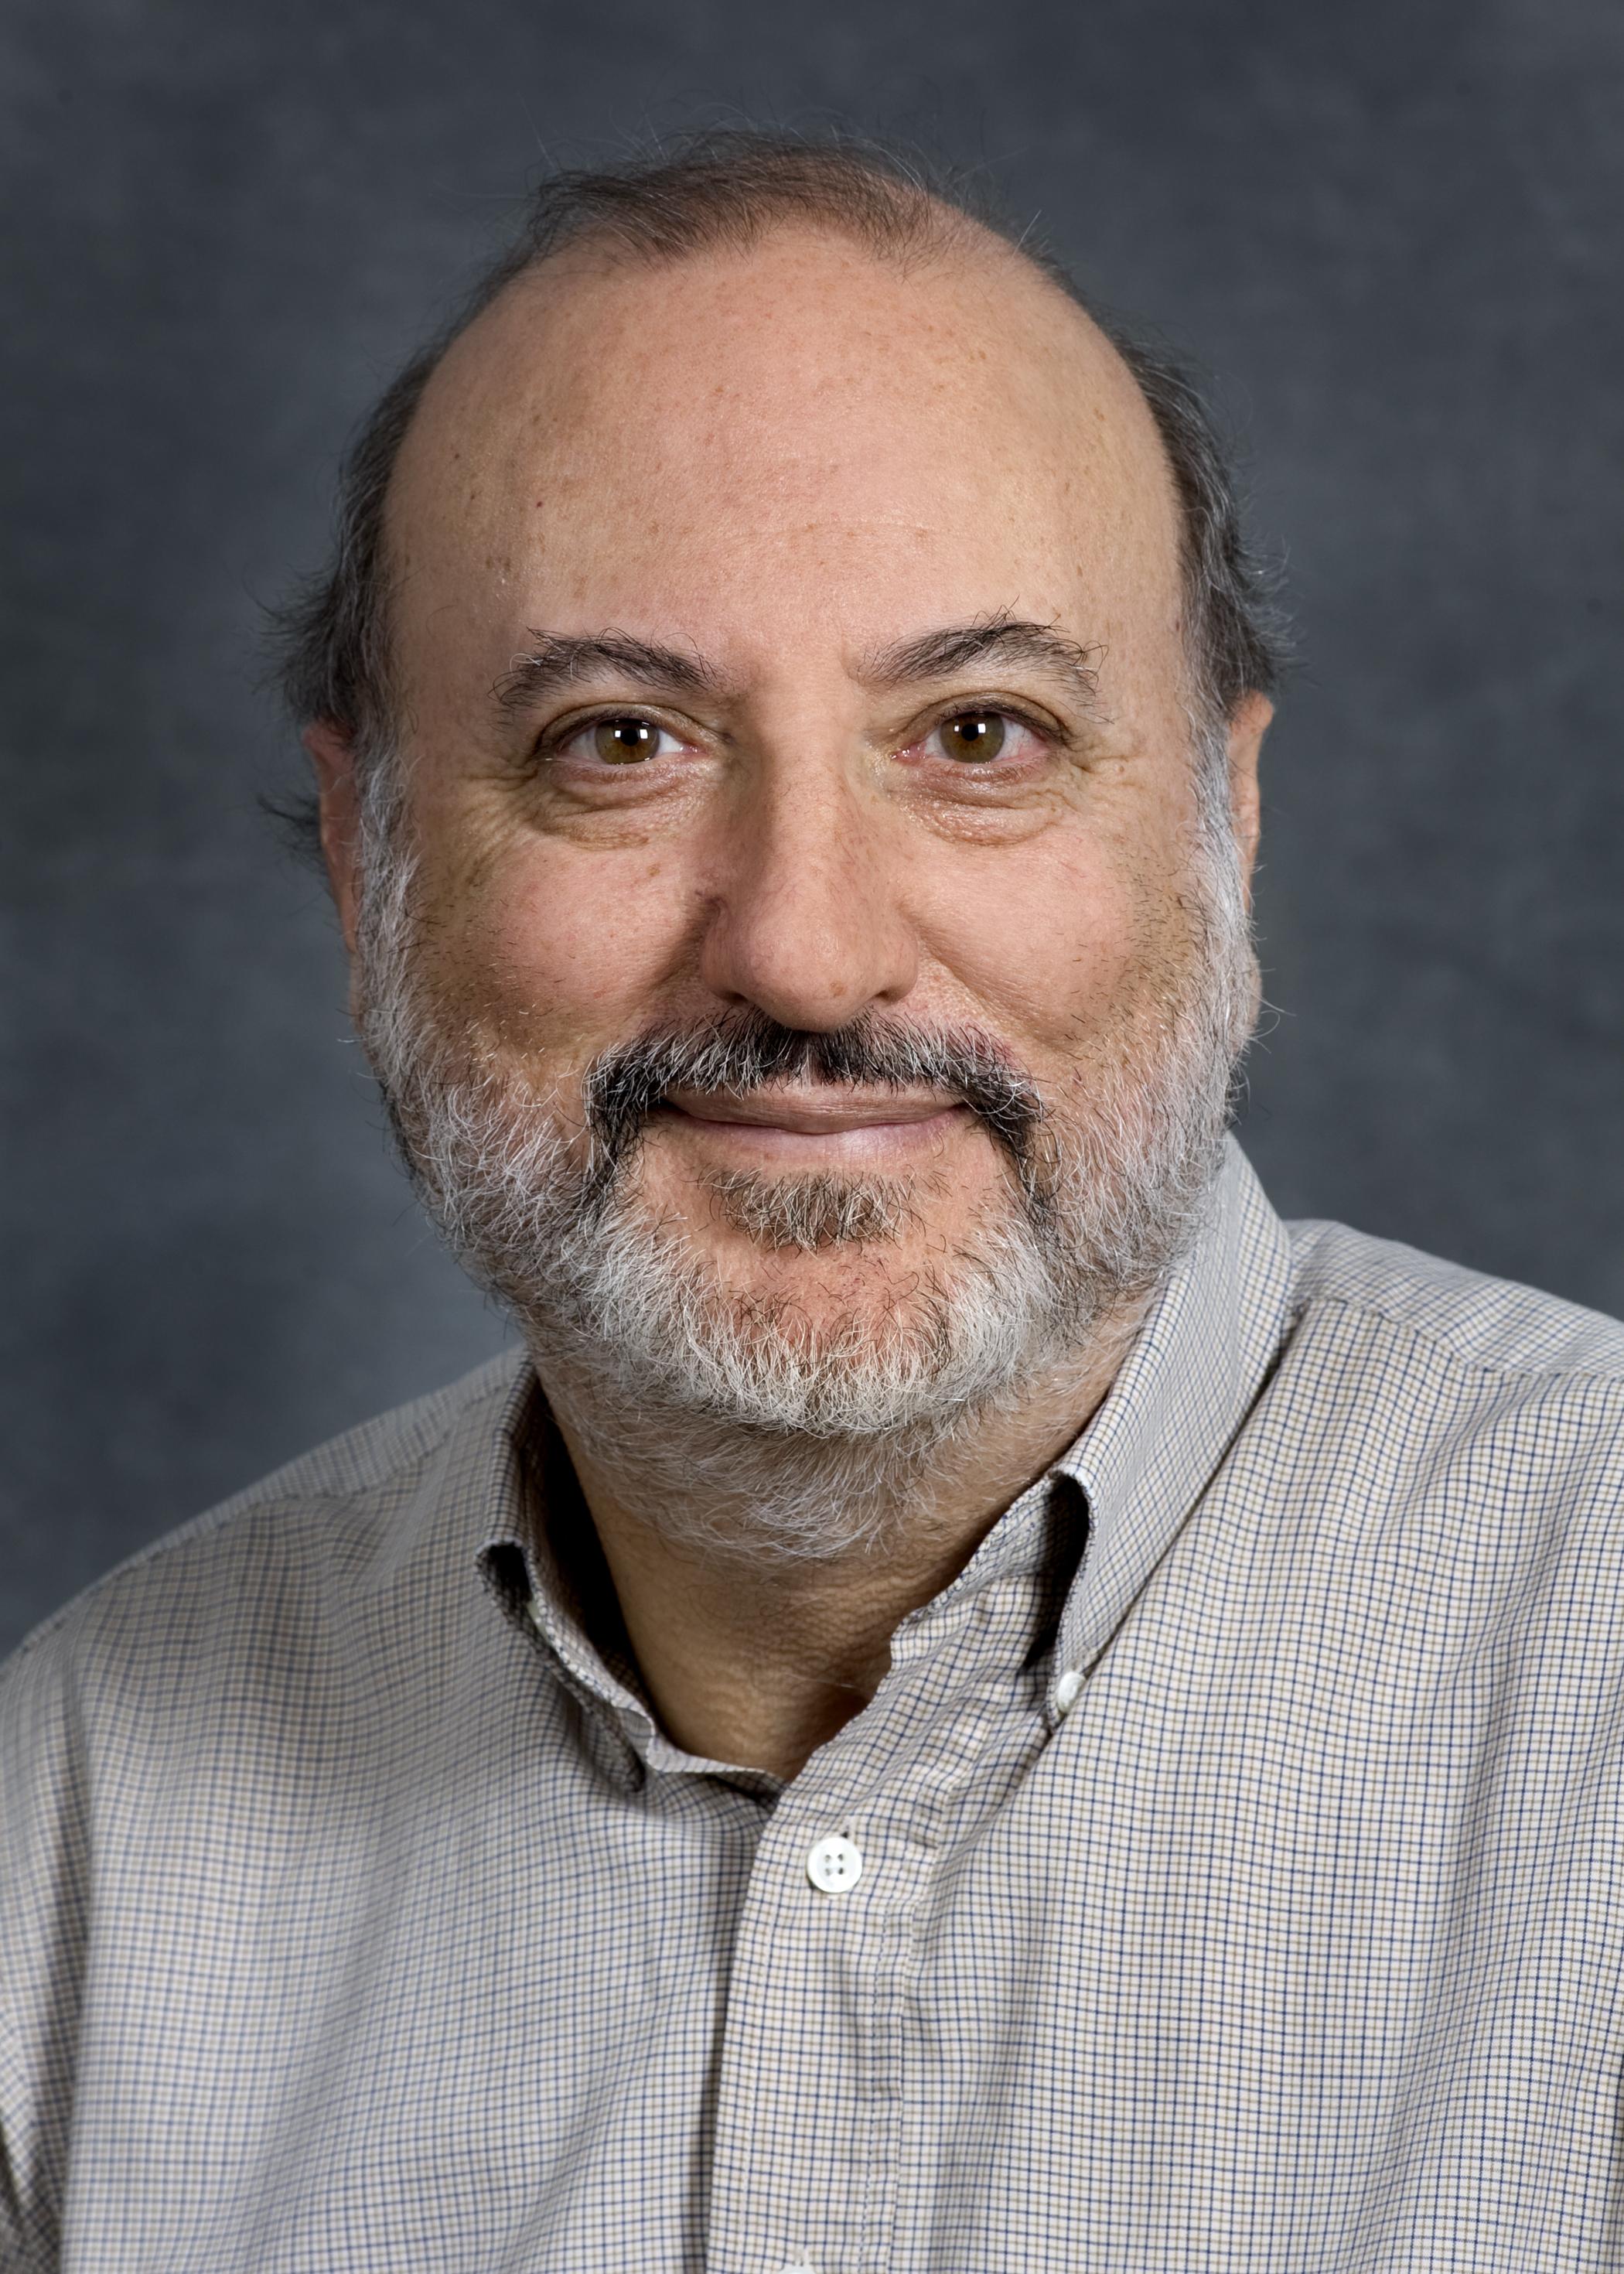 Portrait of Ed Vine, a scientist at EETD.